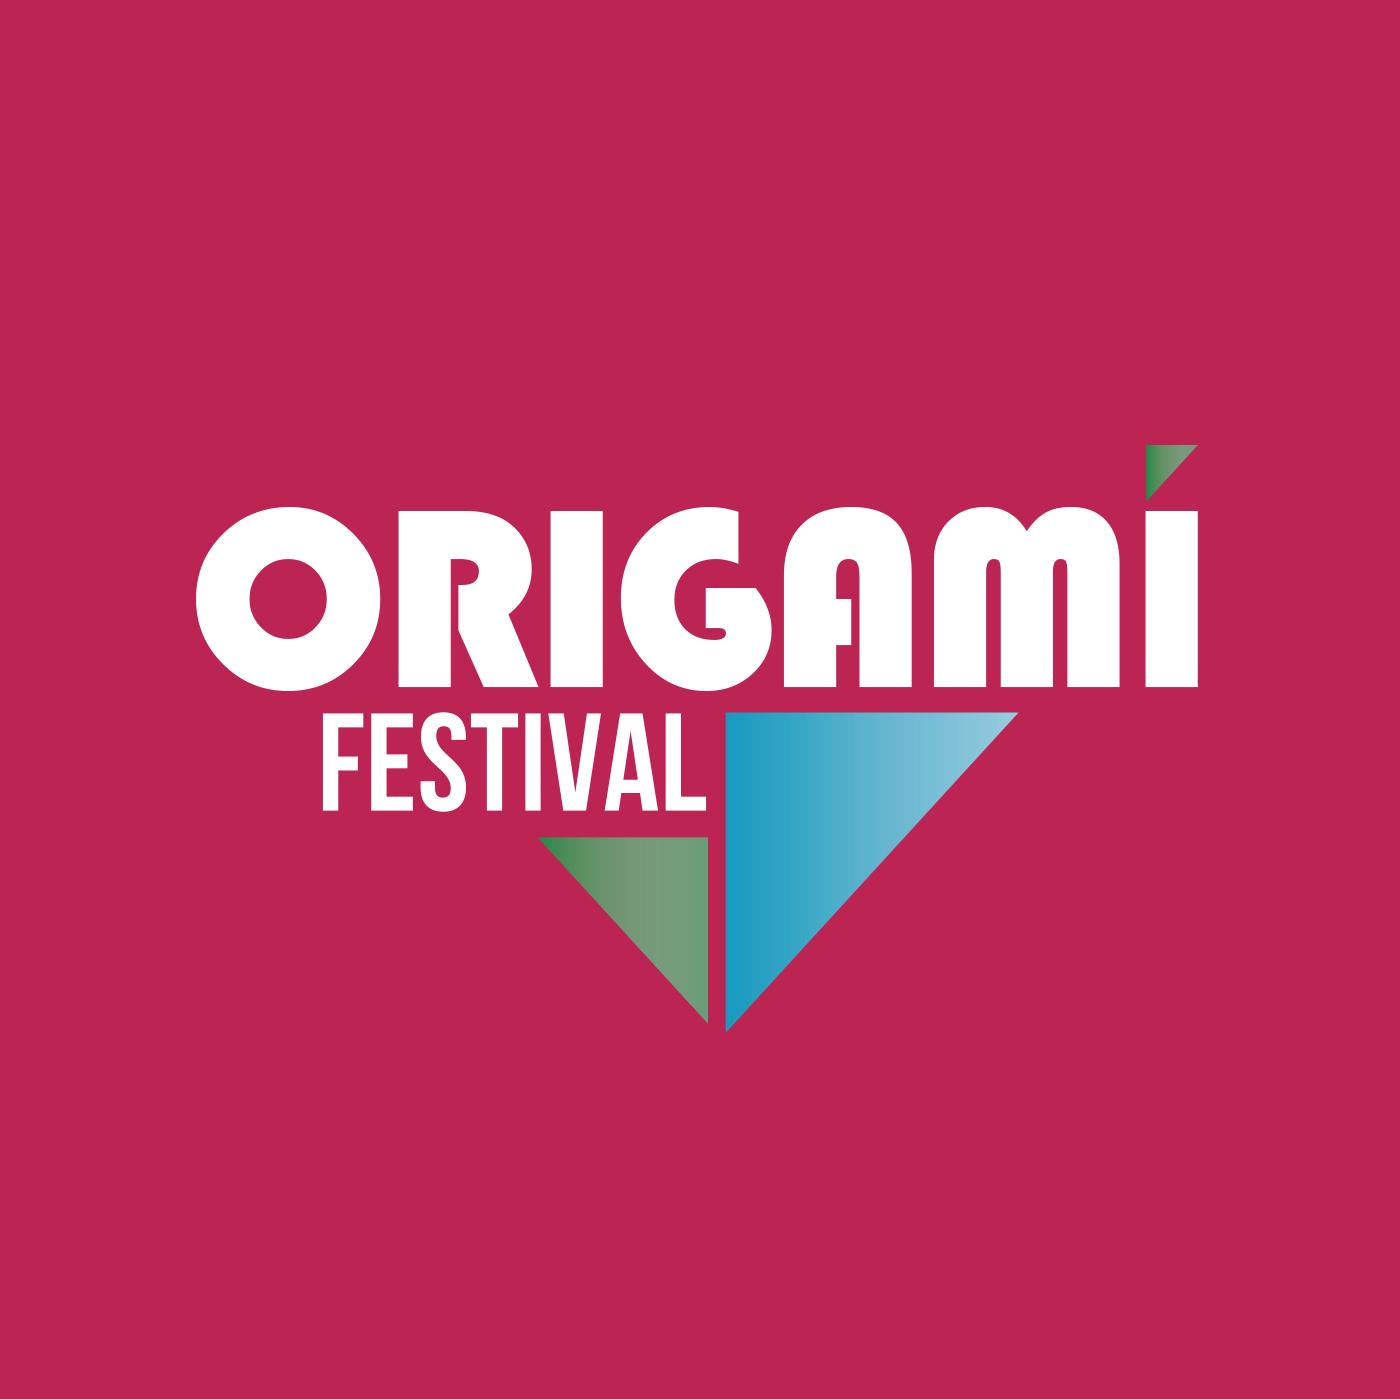 Origami Festival